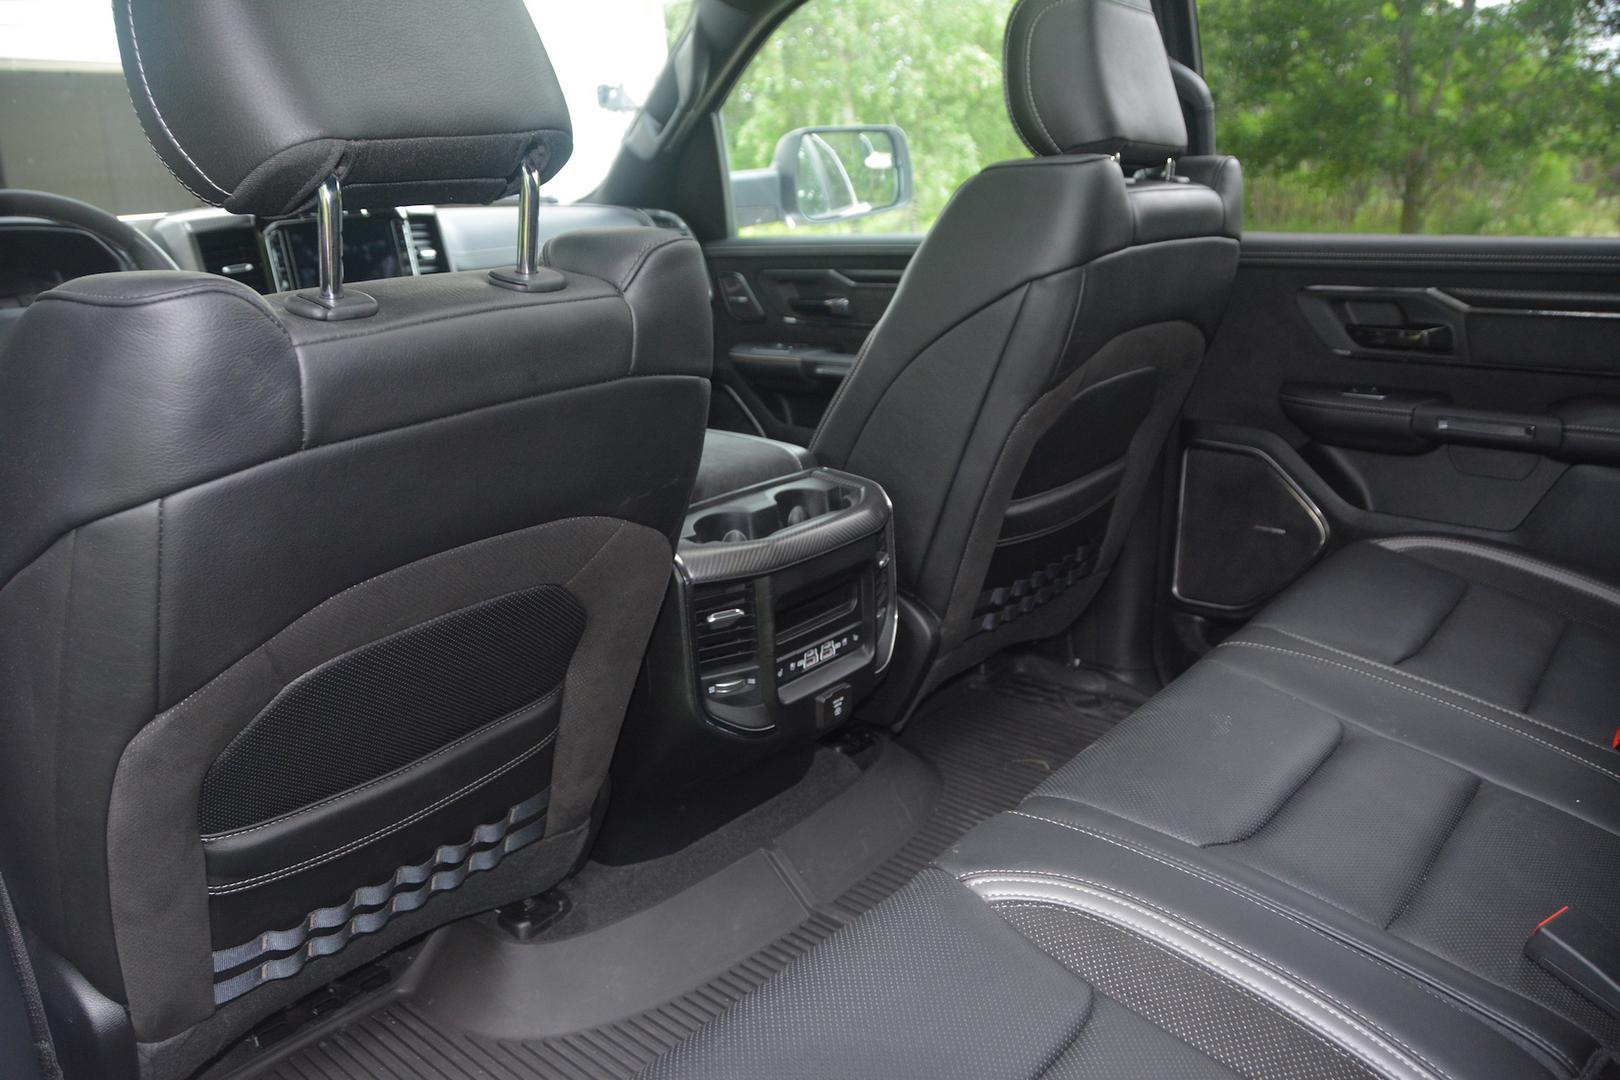 2021 Ram 1500 TRX leather